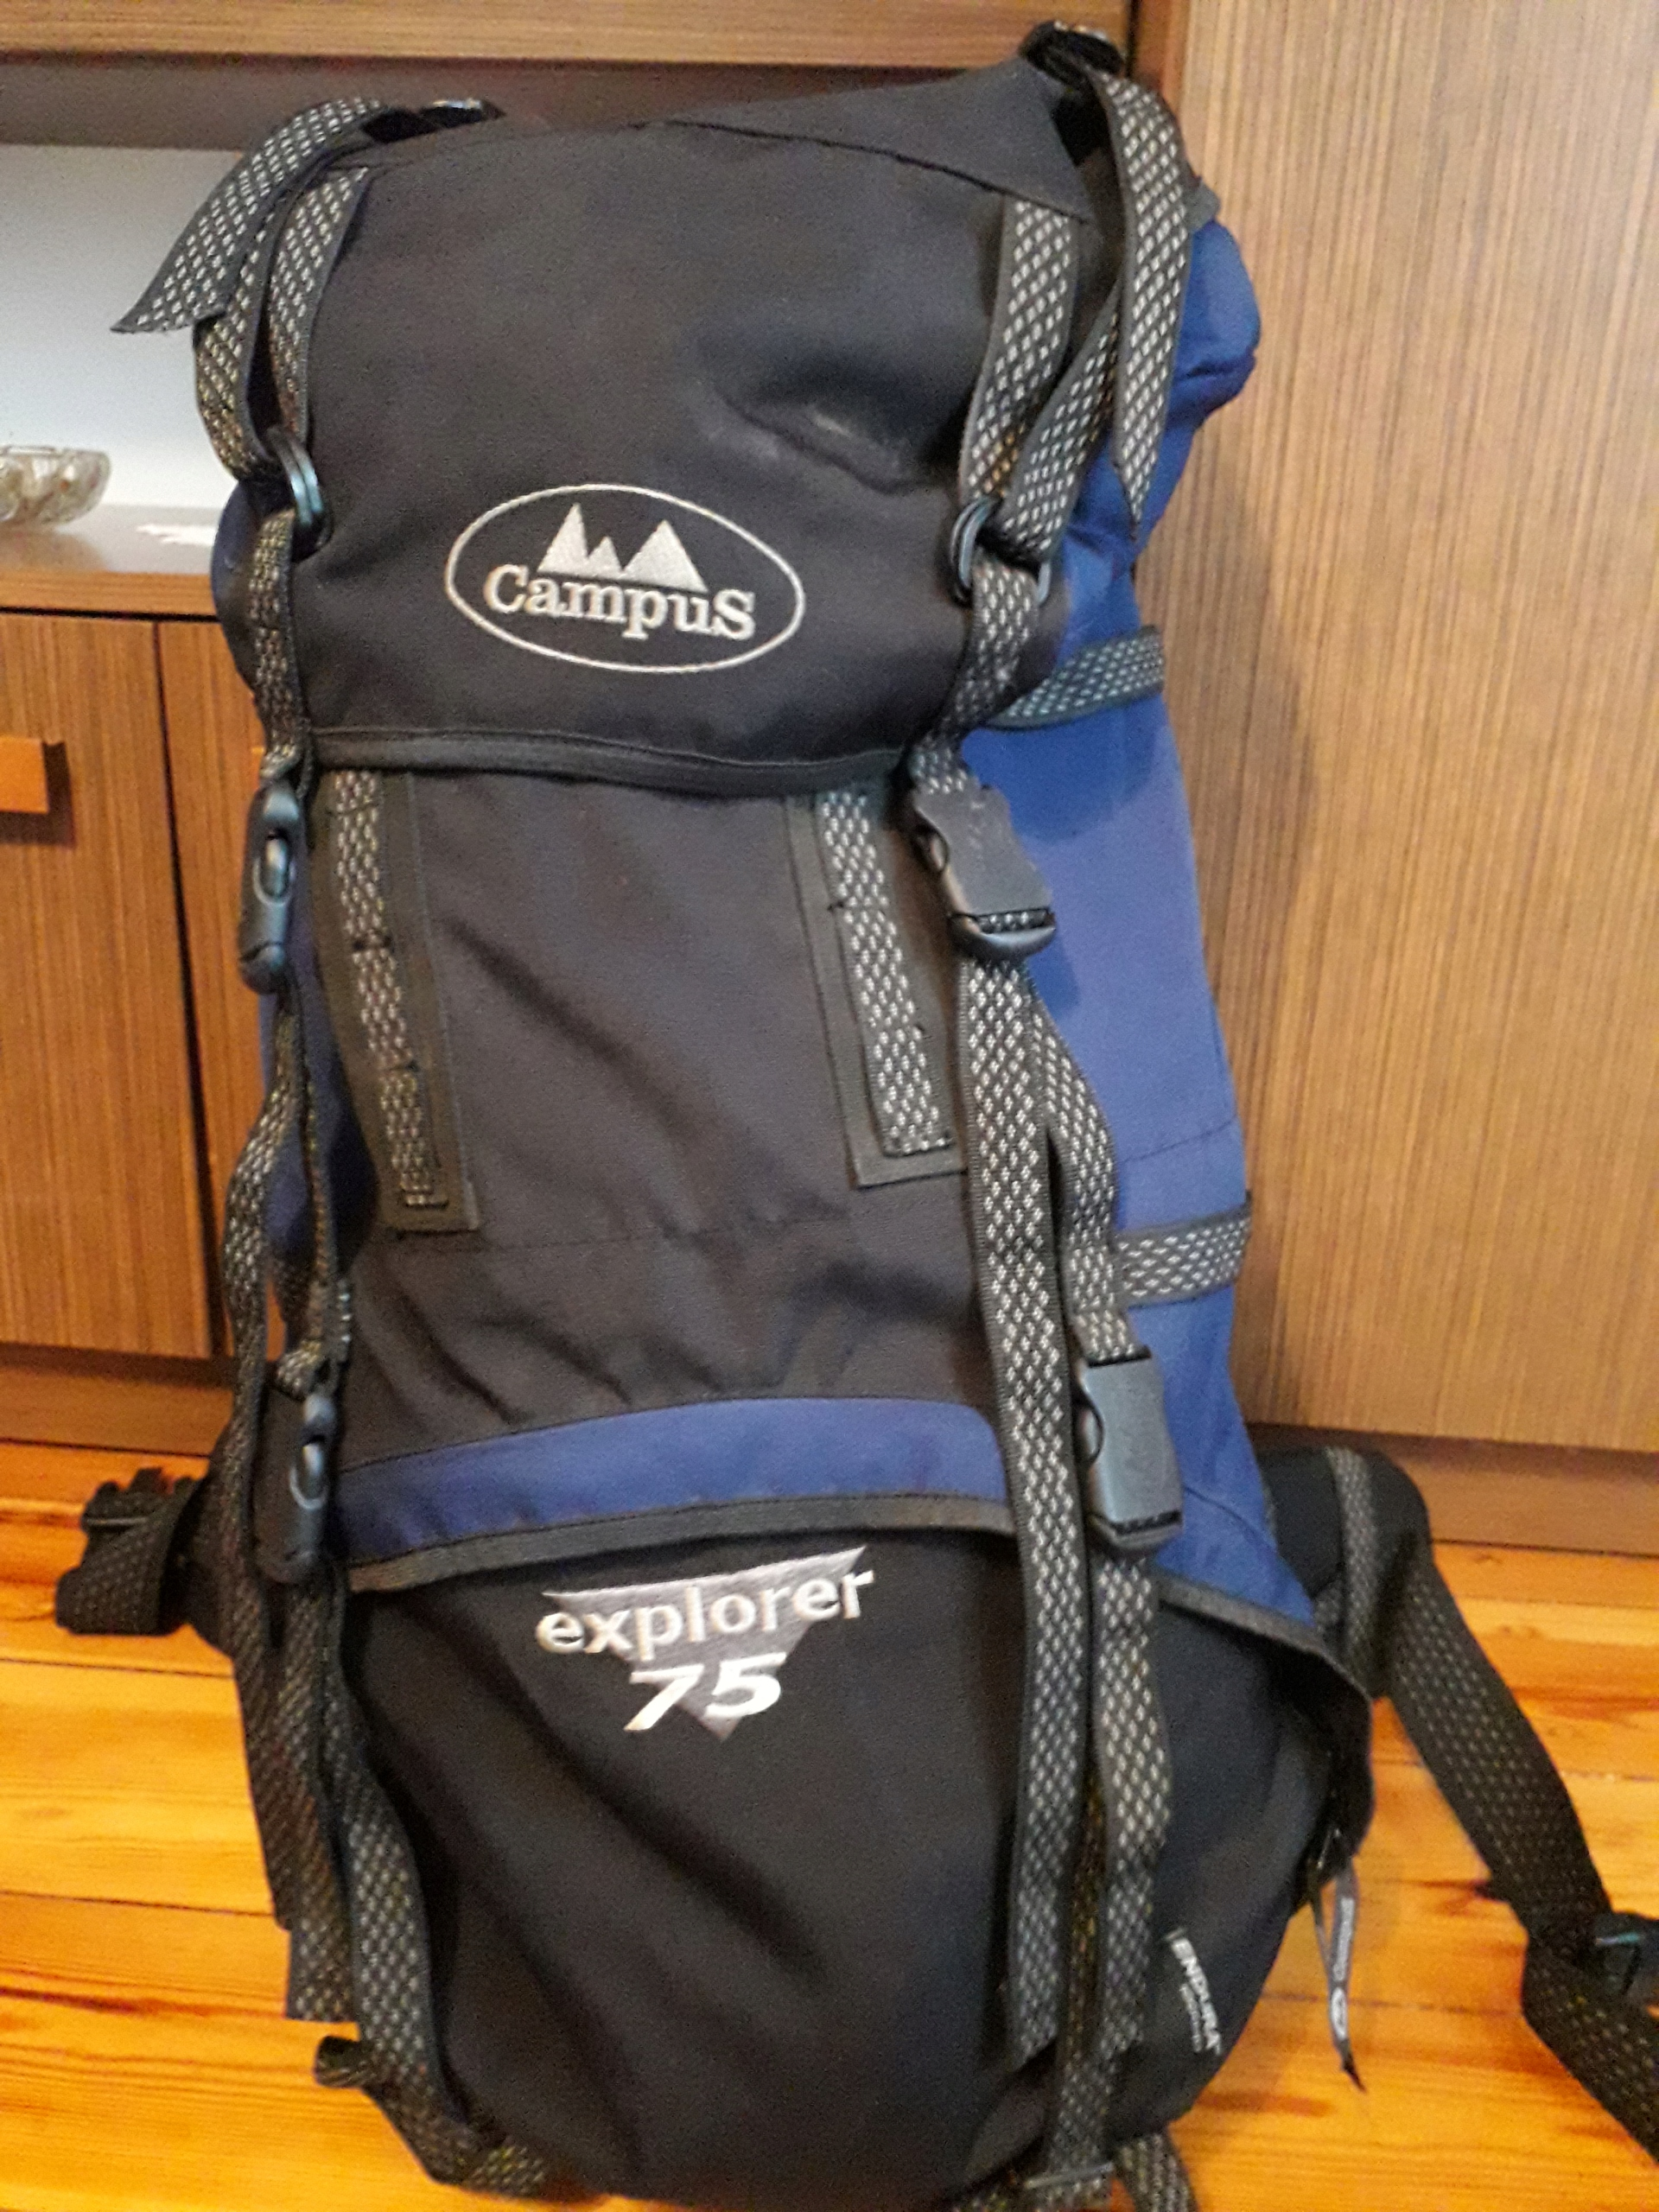 Plecak turystyczny Campus Explorer 75